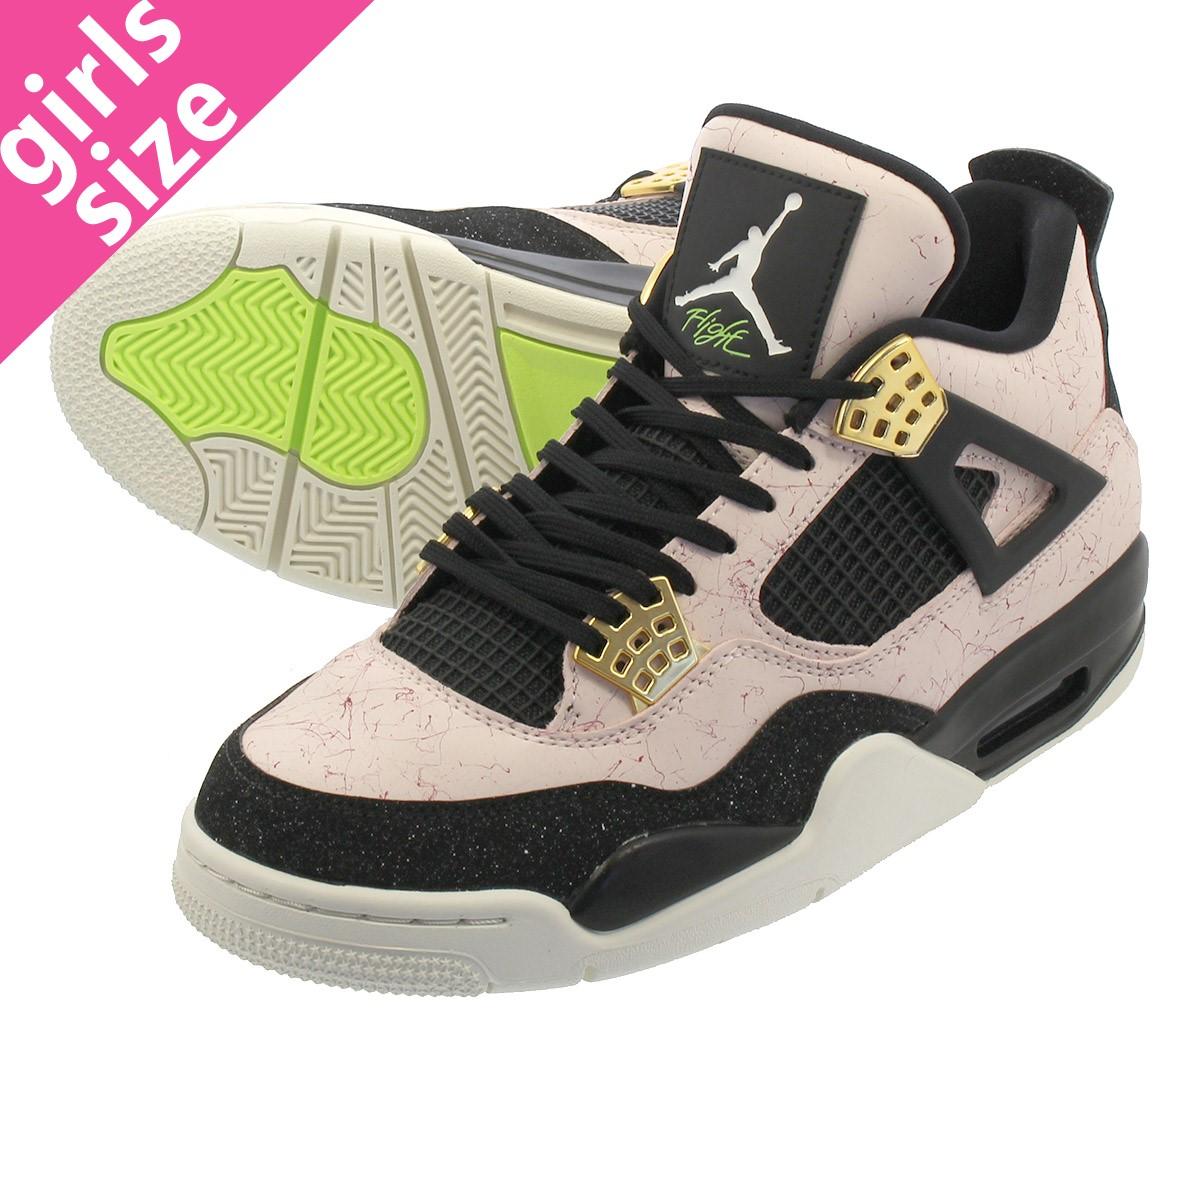 3be9355c9b5 LOWTEX PLUS: NIKE WMNS AIR JORDAN 4 RETRO Nike women Air Jordan 4 nostalgic  SILT RED/BLACK/PHANTOM/VOLT aq9129-601 | Rakuten Global Market